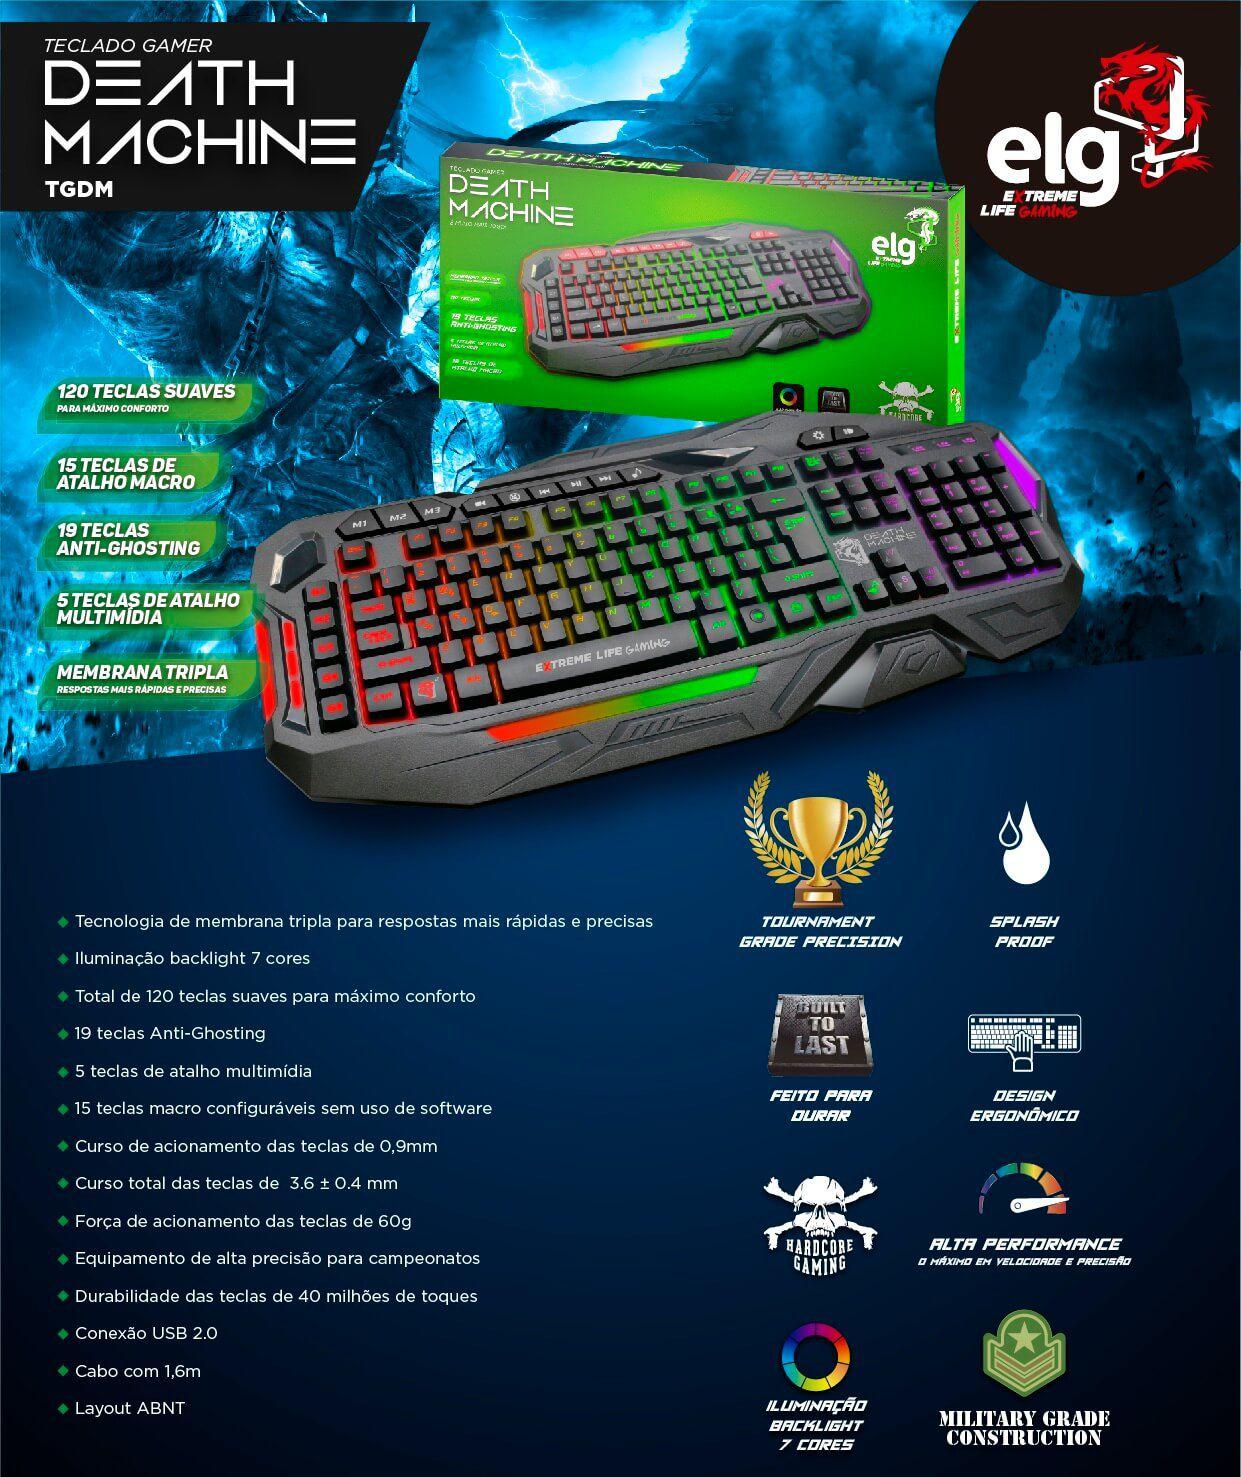 Teclado Gamer Membrana Tripla 120 Teclas iluminado Death Machine TGDM ELG  - Central Suportes